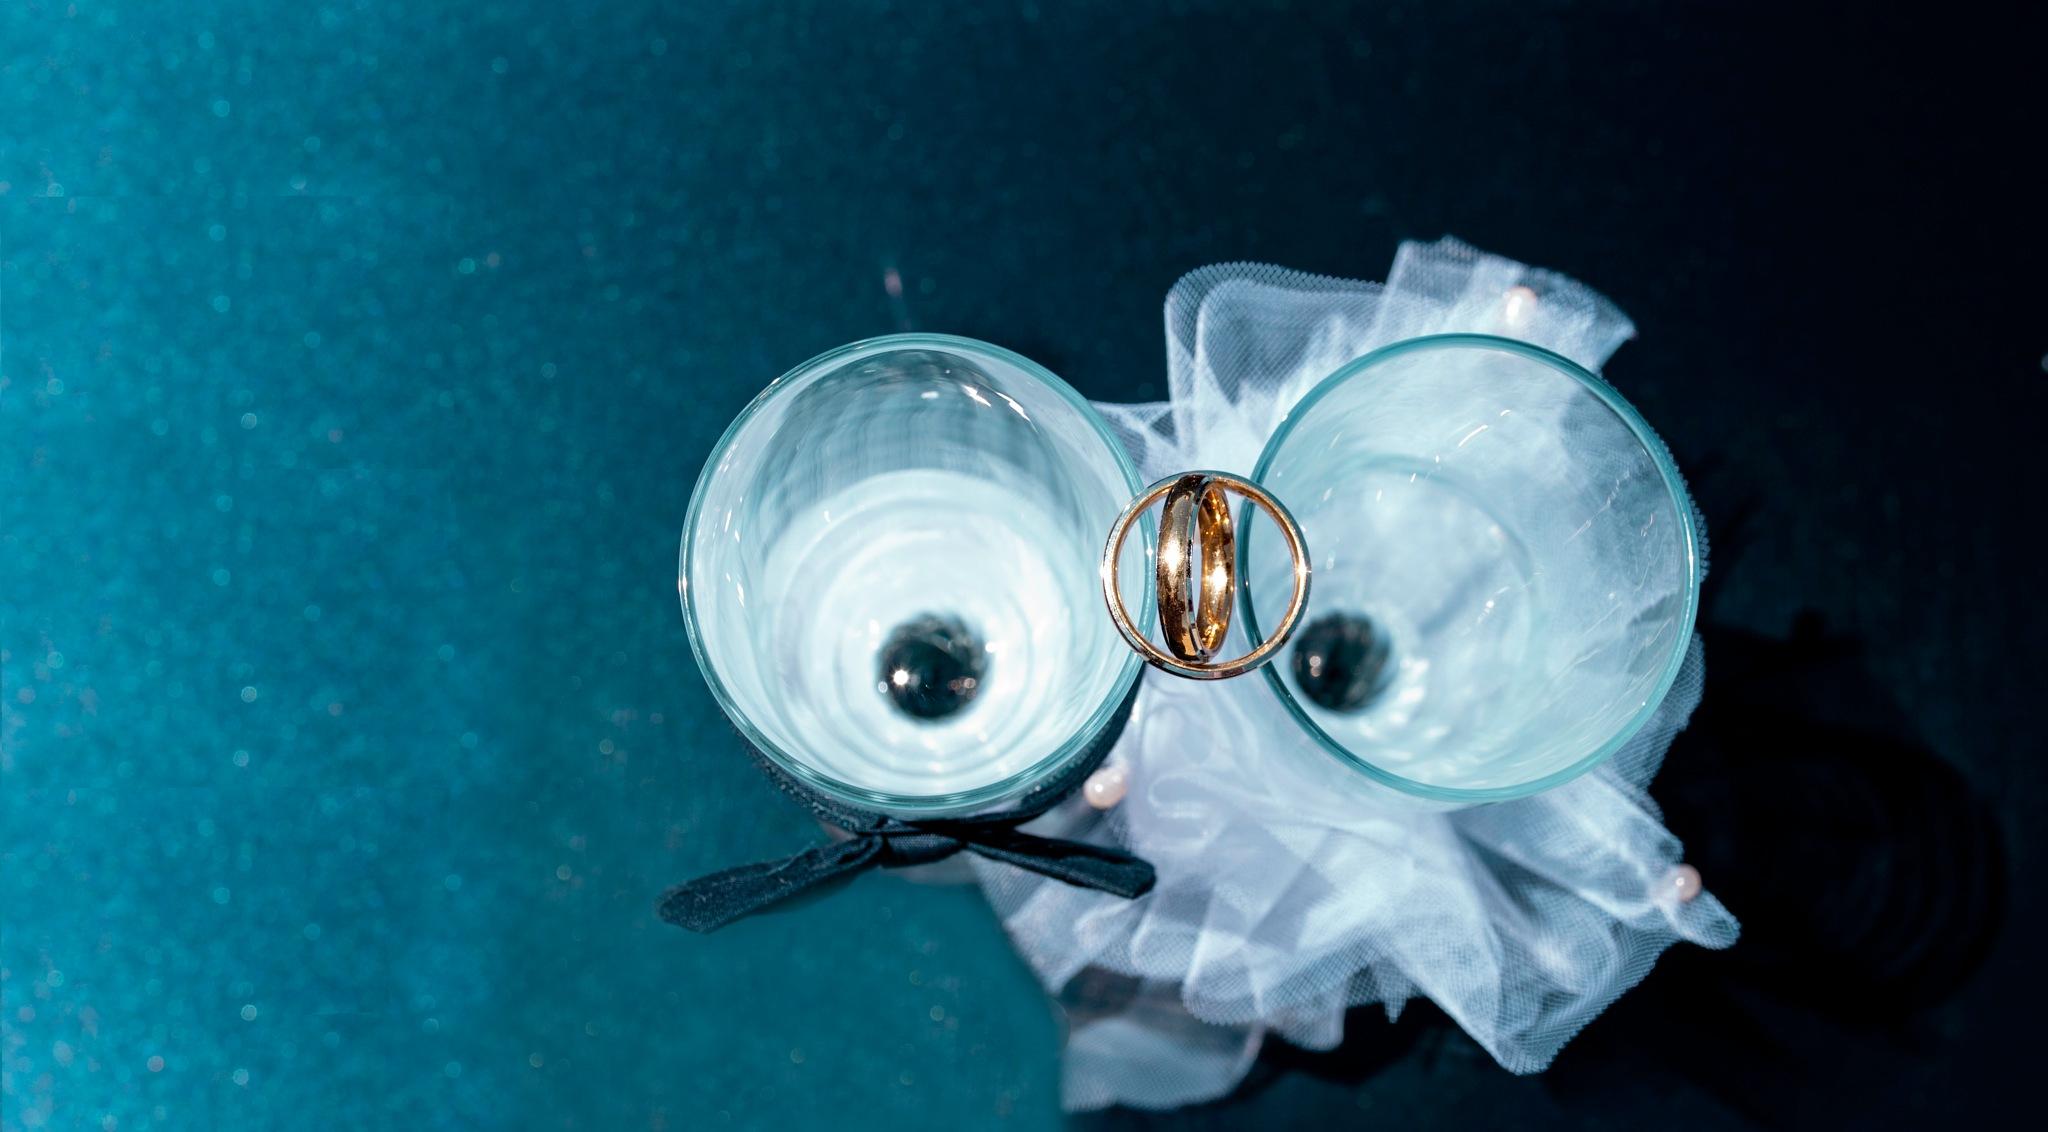 The wedding rings by AlexMara